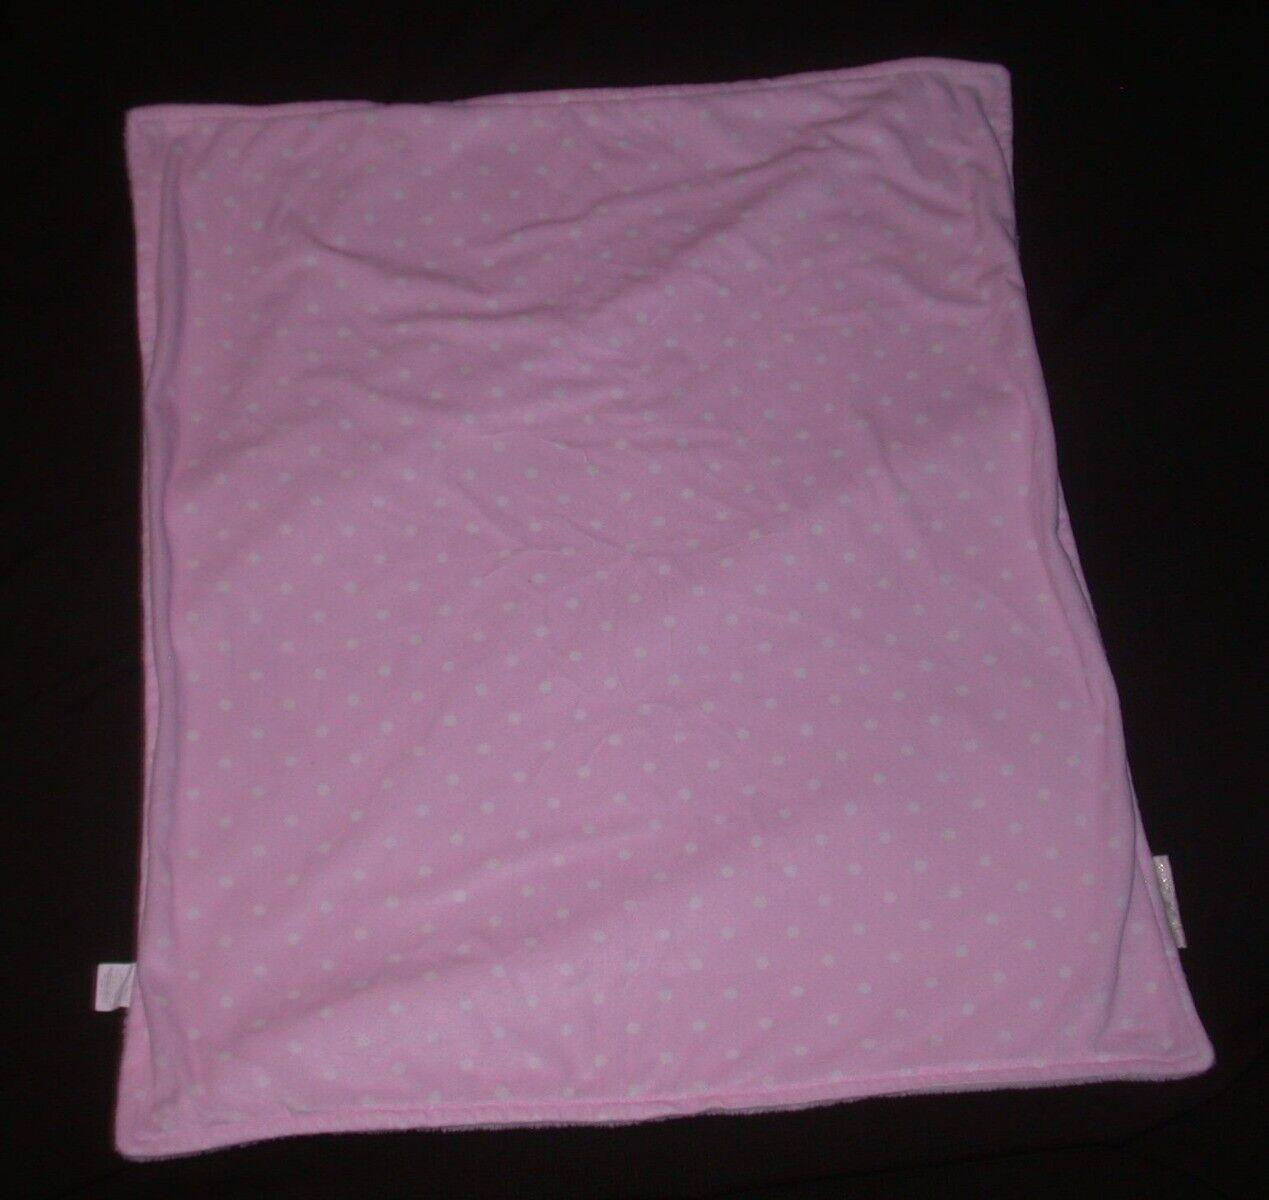 BLANKETS BEYOND Pink White Polka Dot Fleece Security Lovie Lovey Plush 28x31 - $4.99